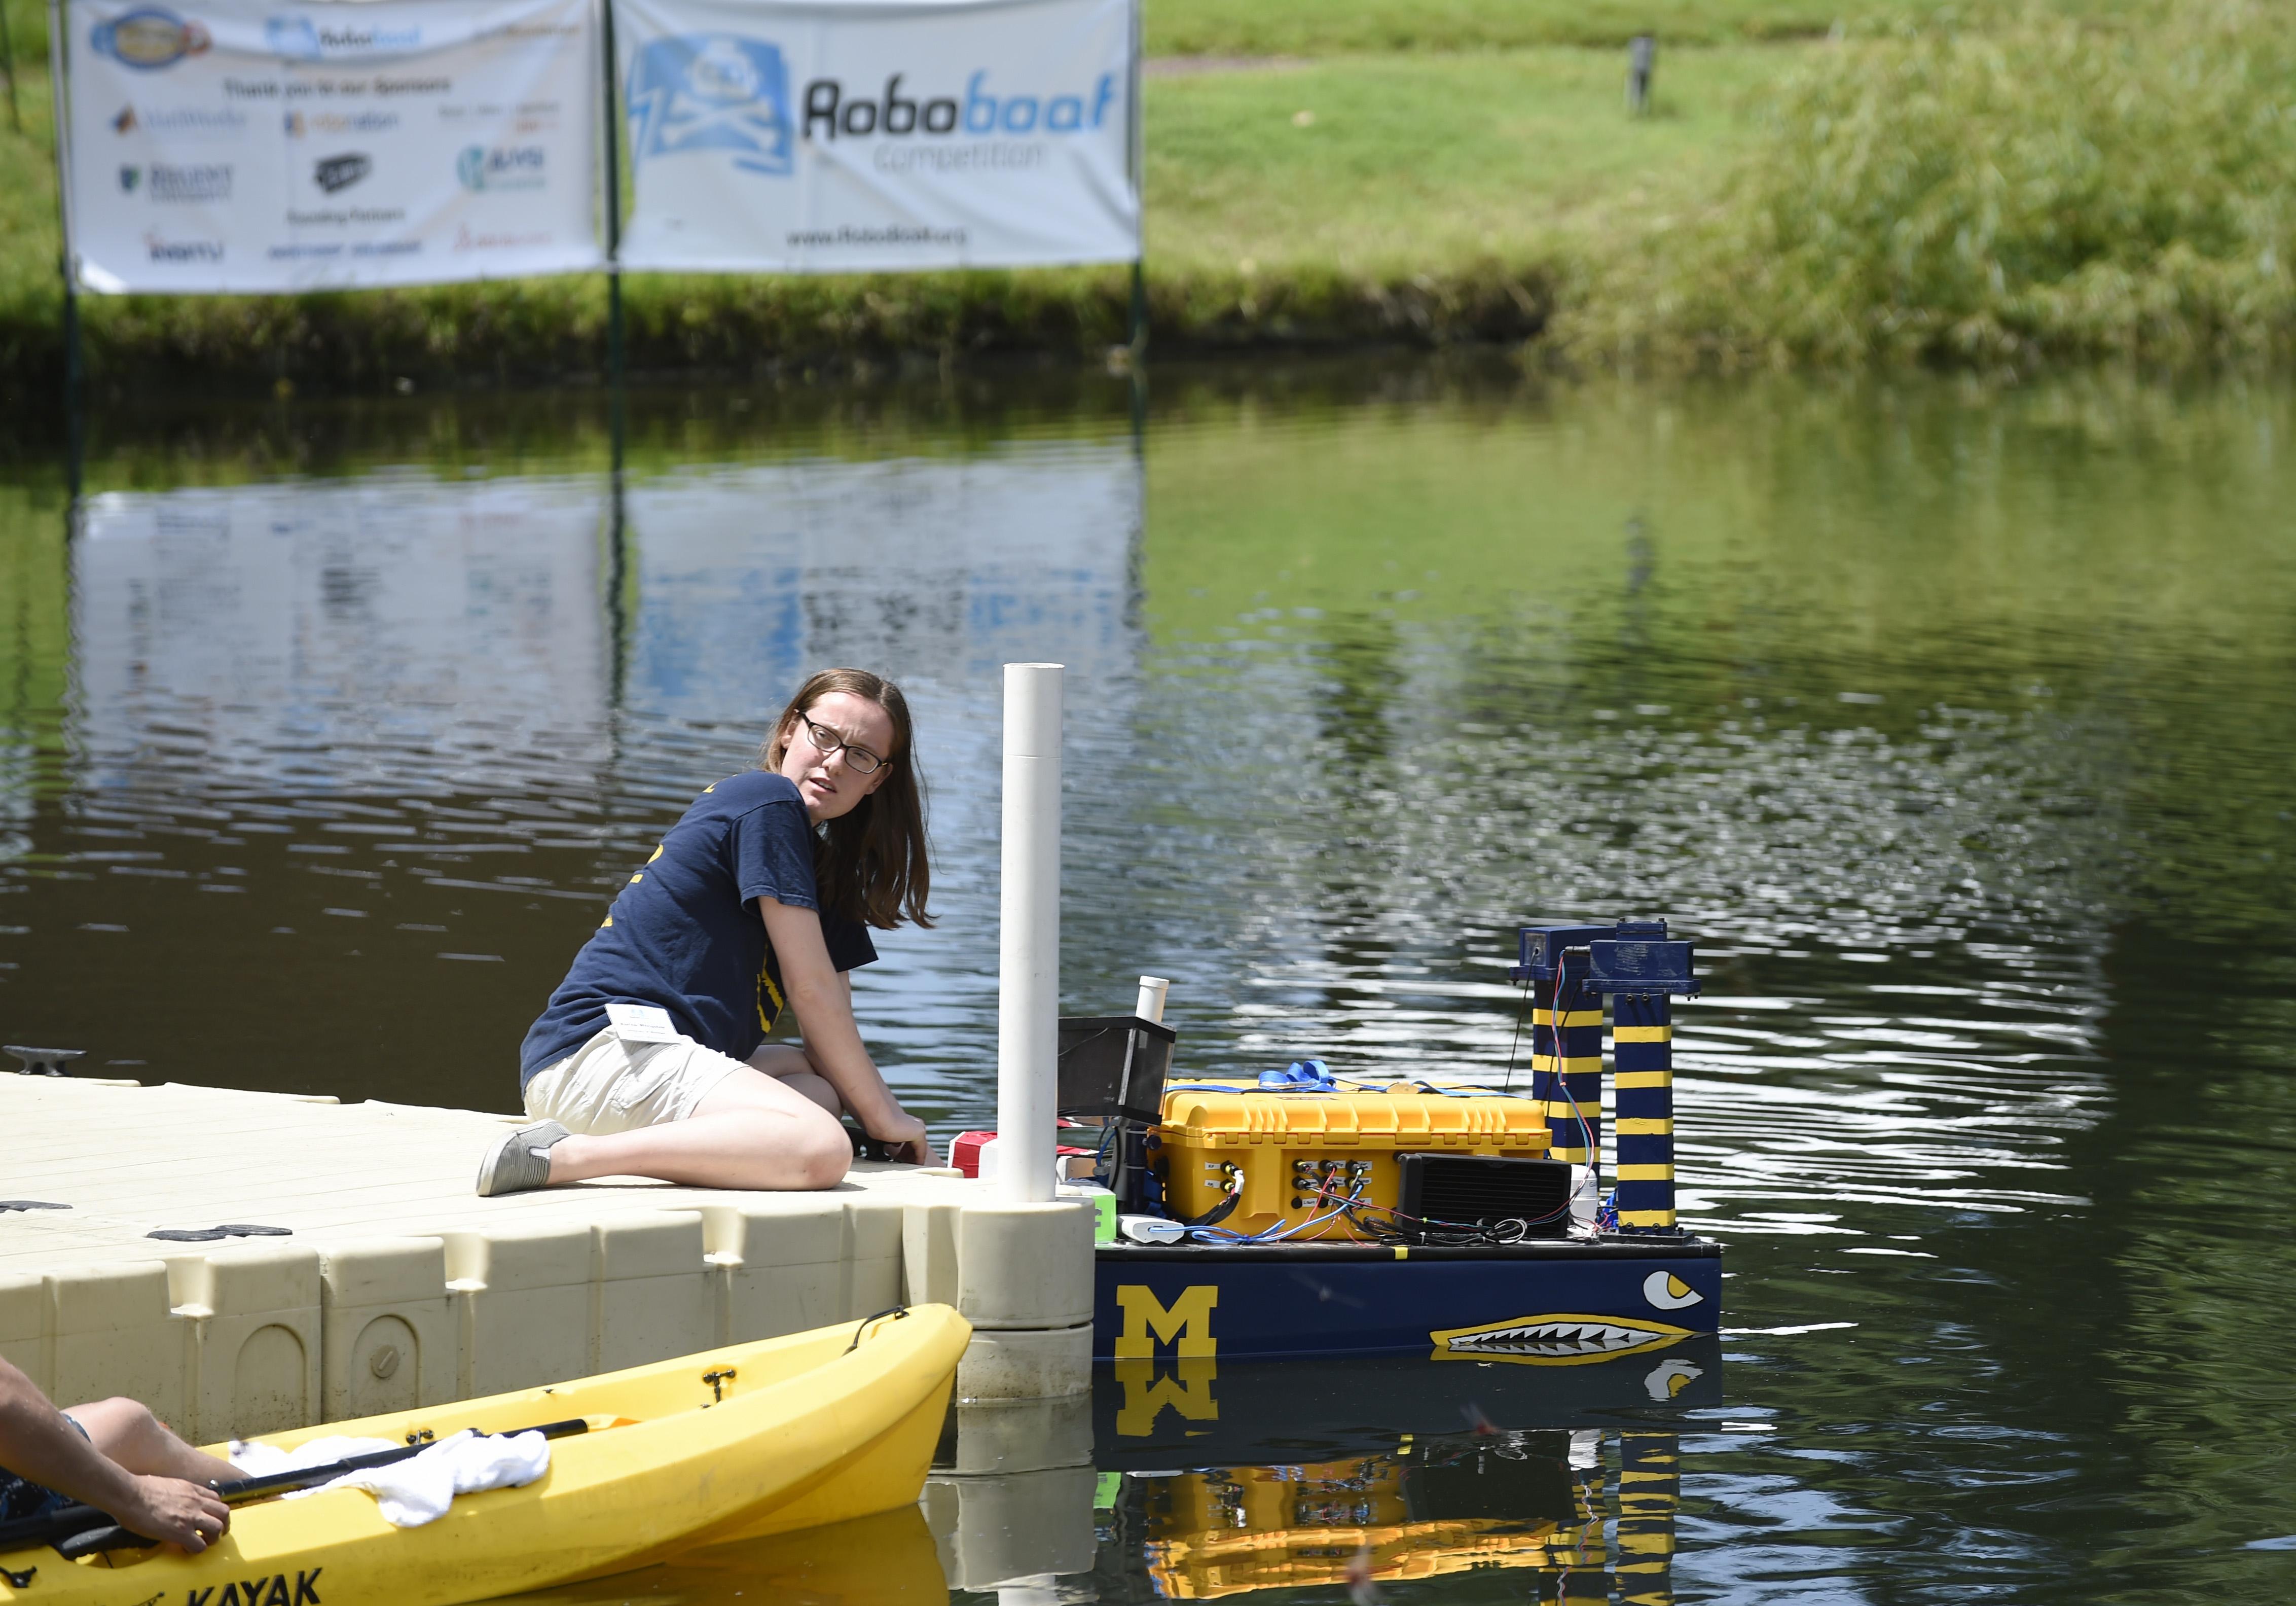 Embry-Riddle Aeronautical University, SeaPerch, RoboBoat Team Lead